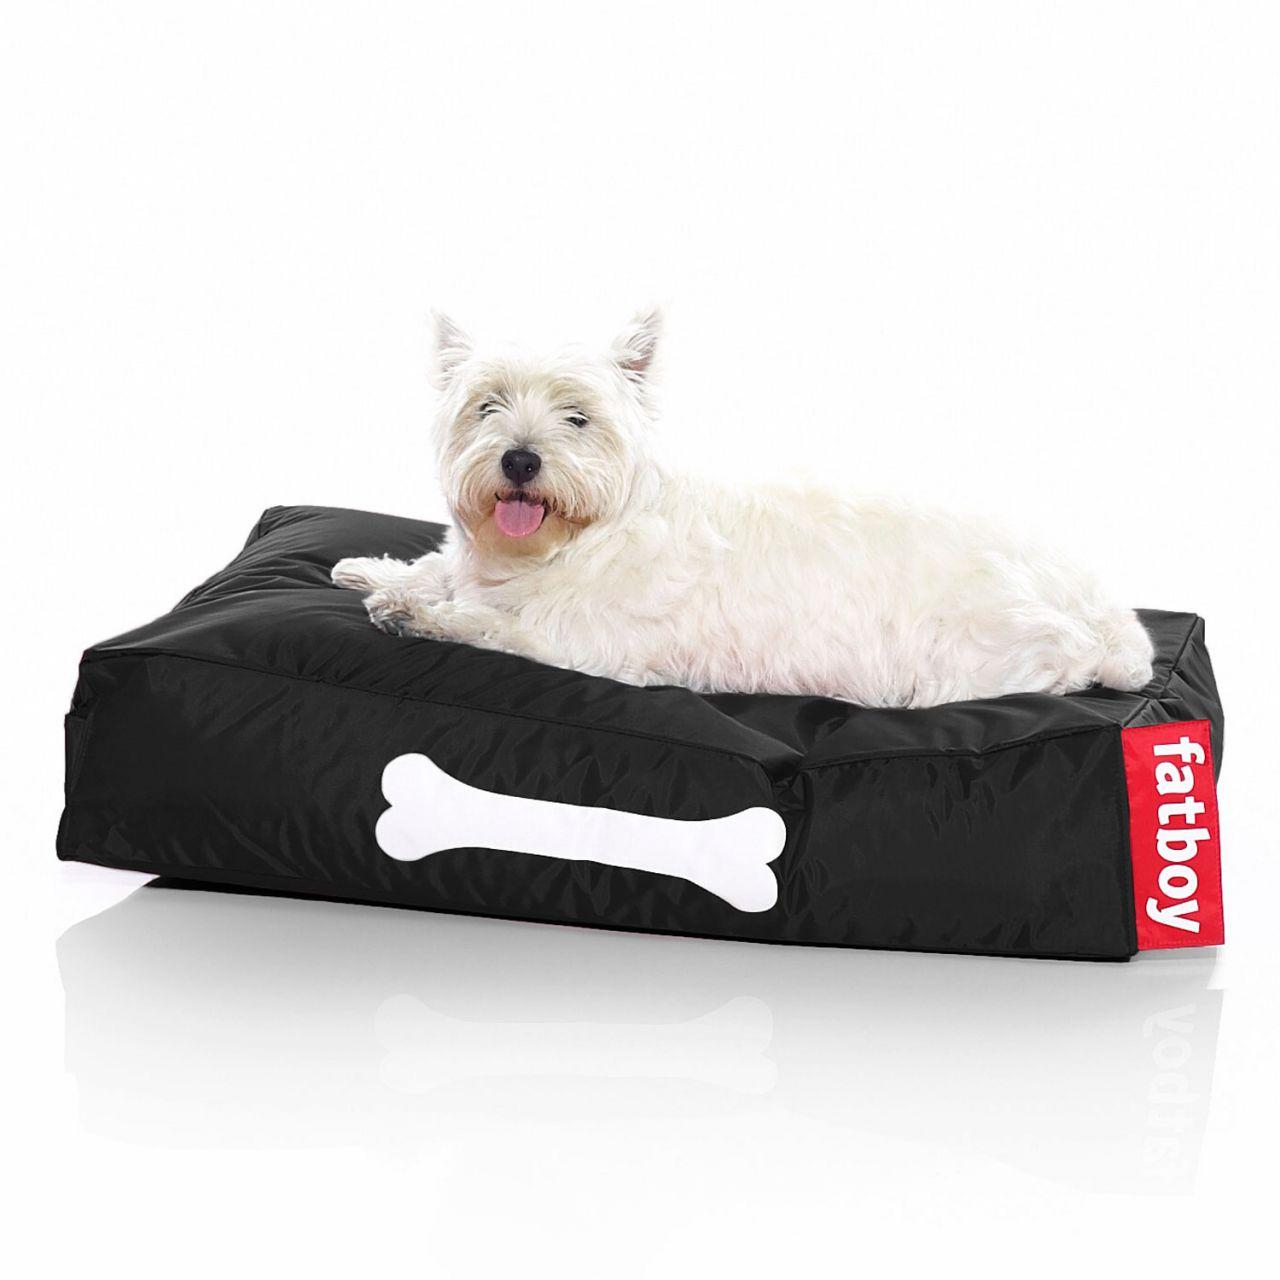 Fatboy - Doggielounge Hundekissen 900.0051